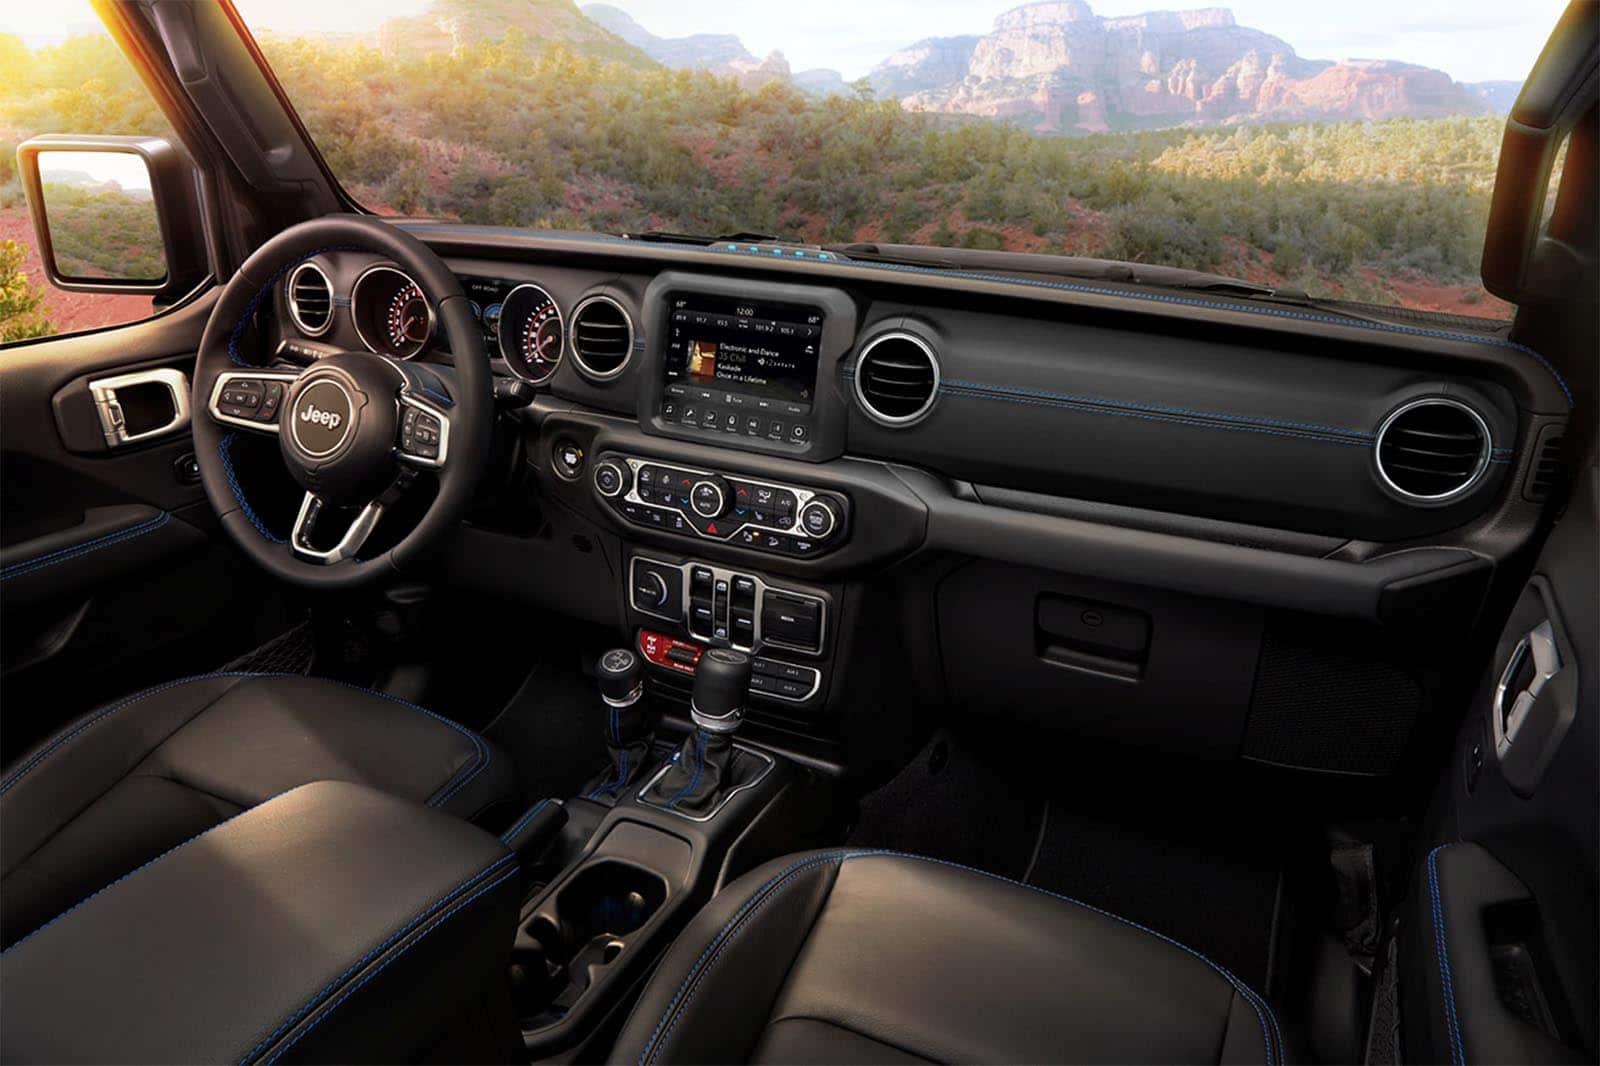 Jeep Electrifies With New Wrangler 4xe - The Detroit Bureau